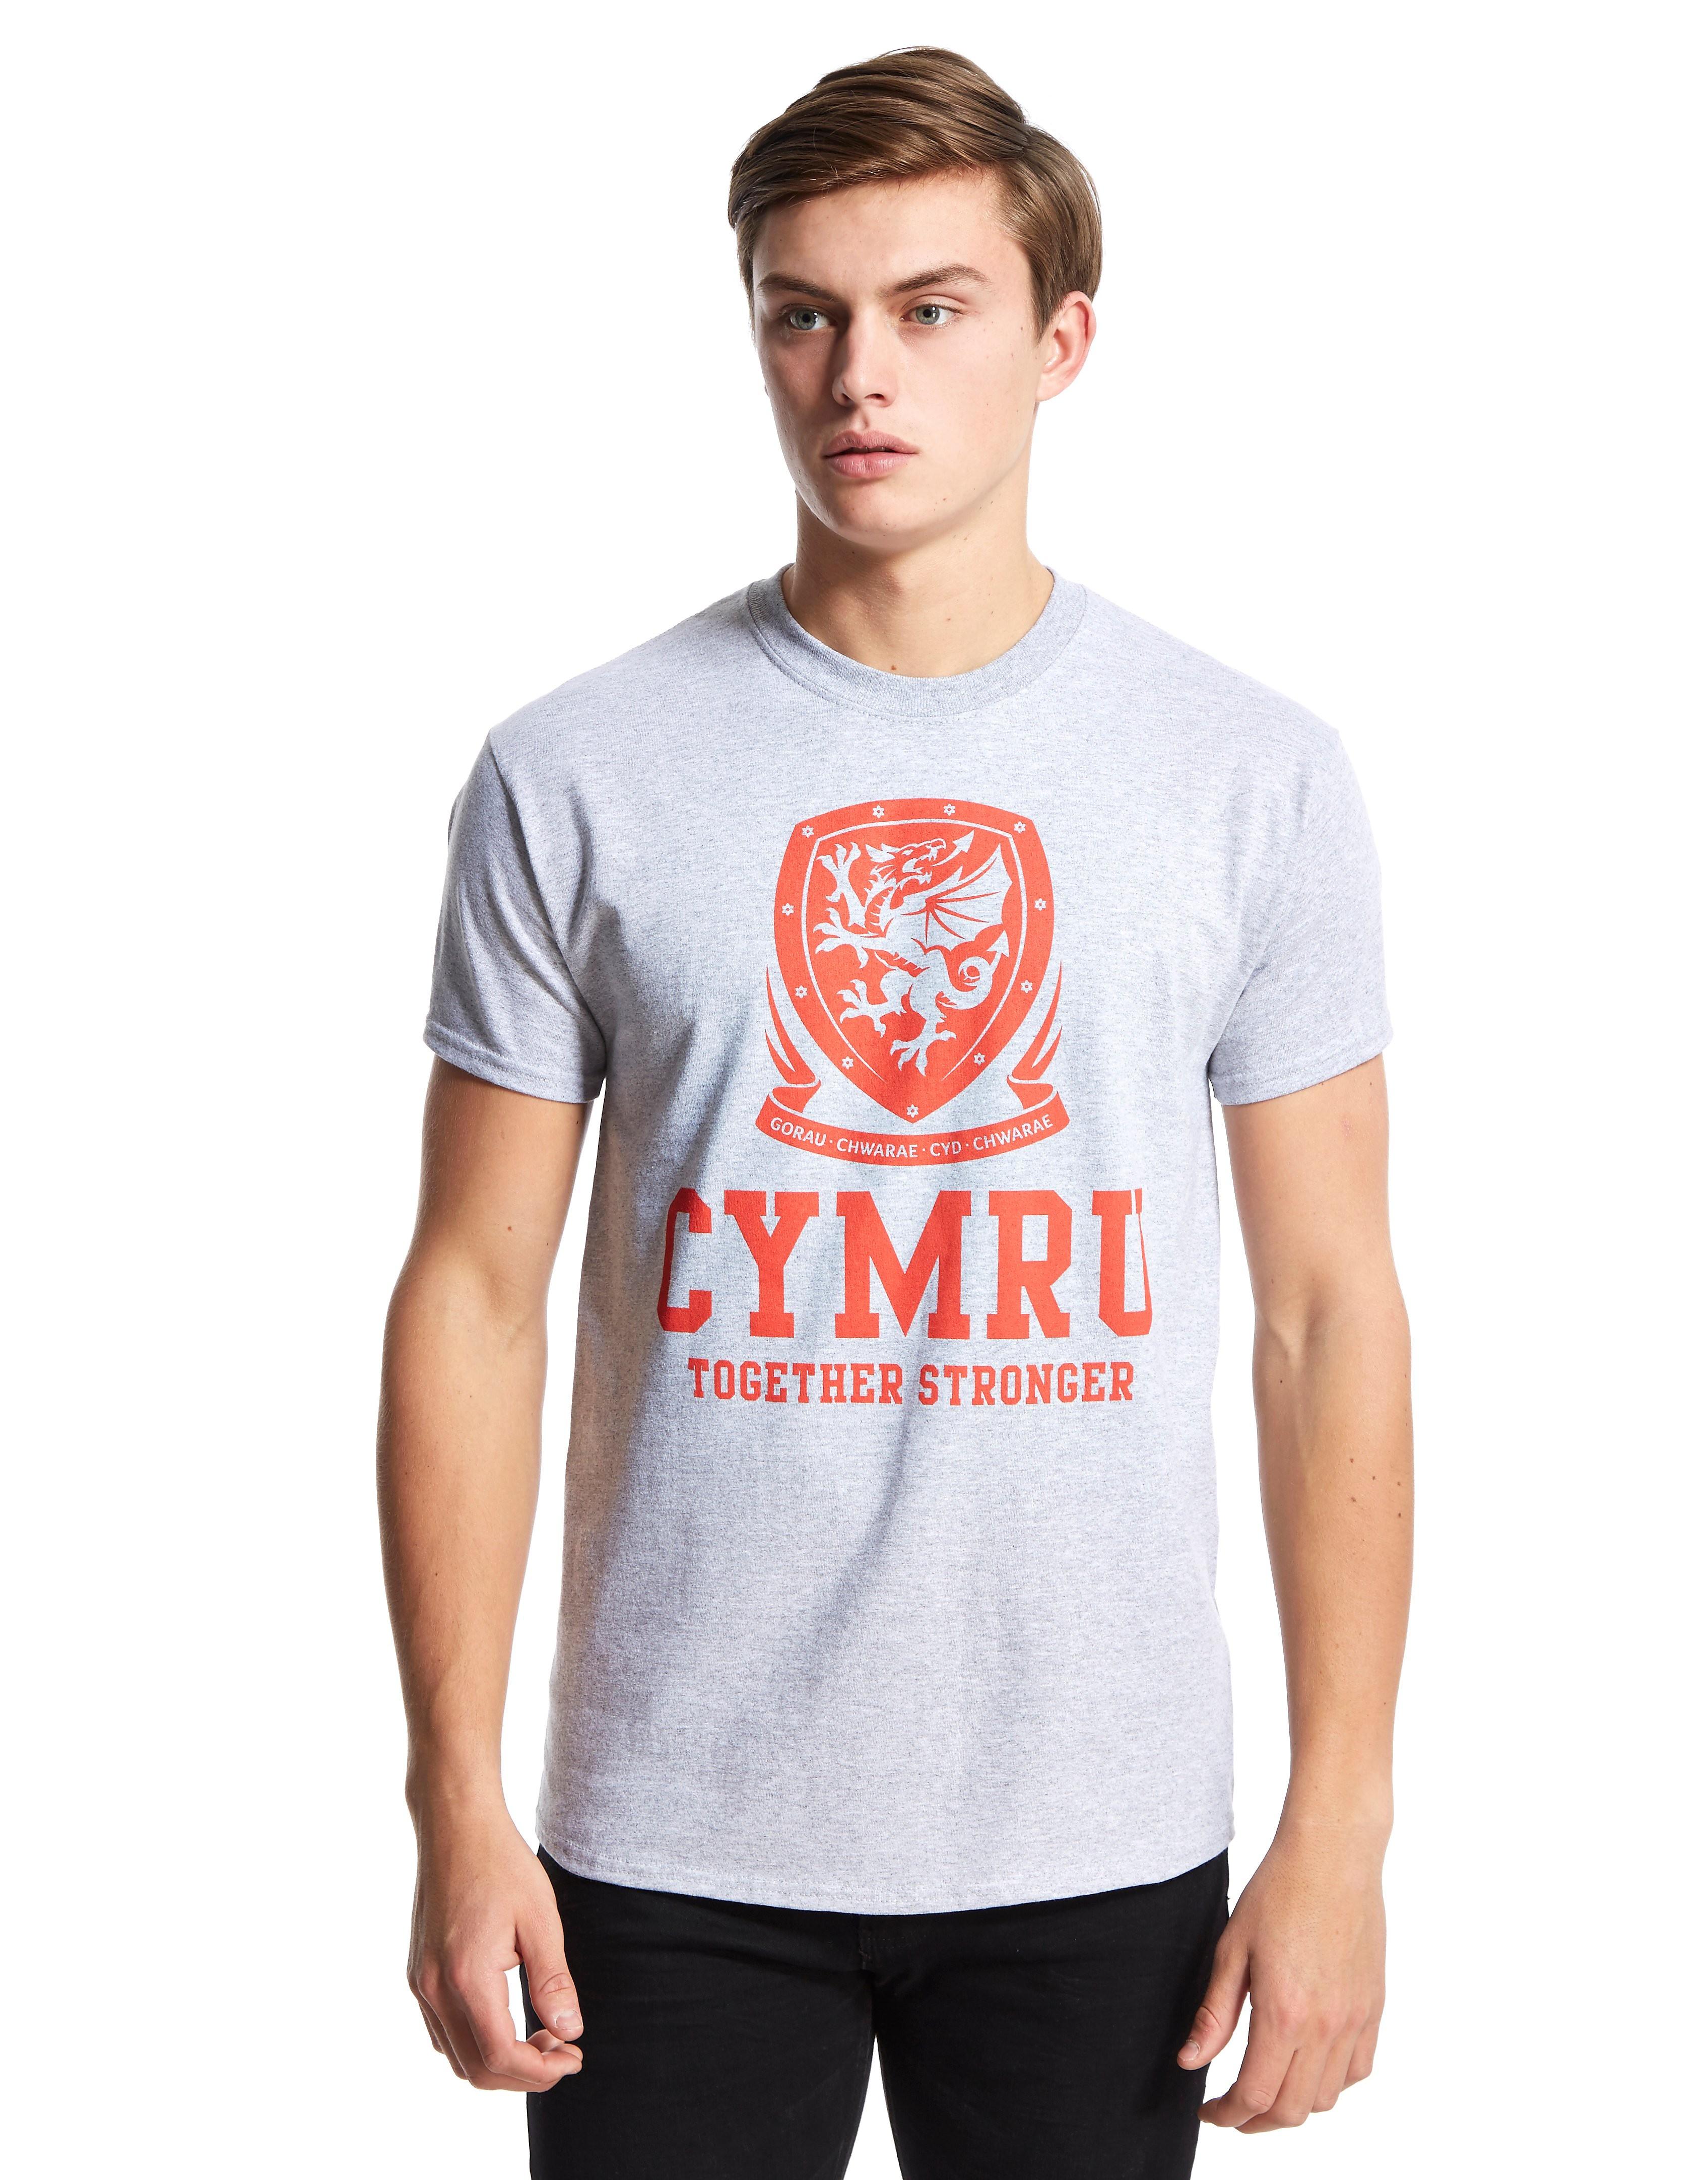 Official Team Camiseta Cymru de Gales